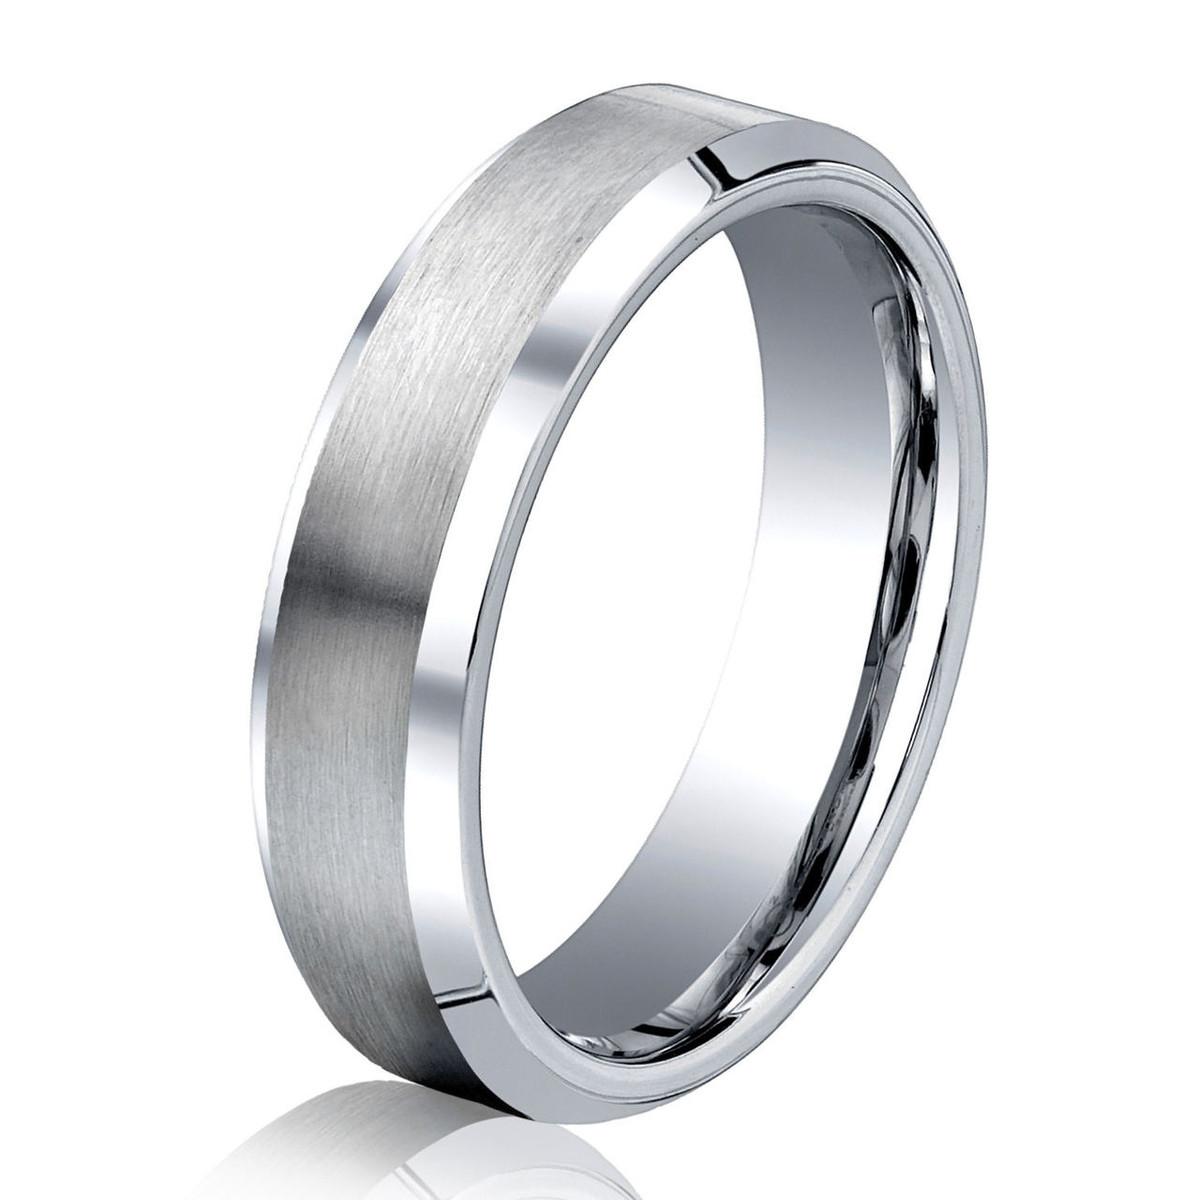 Cobalt Chrome Classic Beveled Wedding Ring